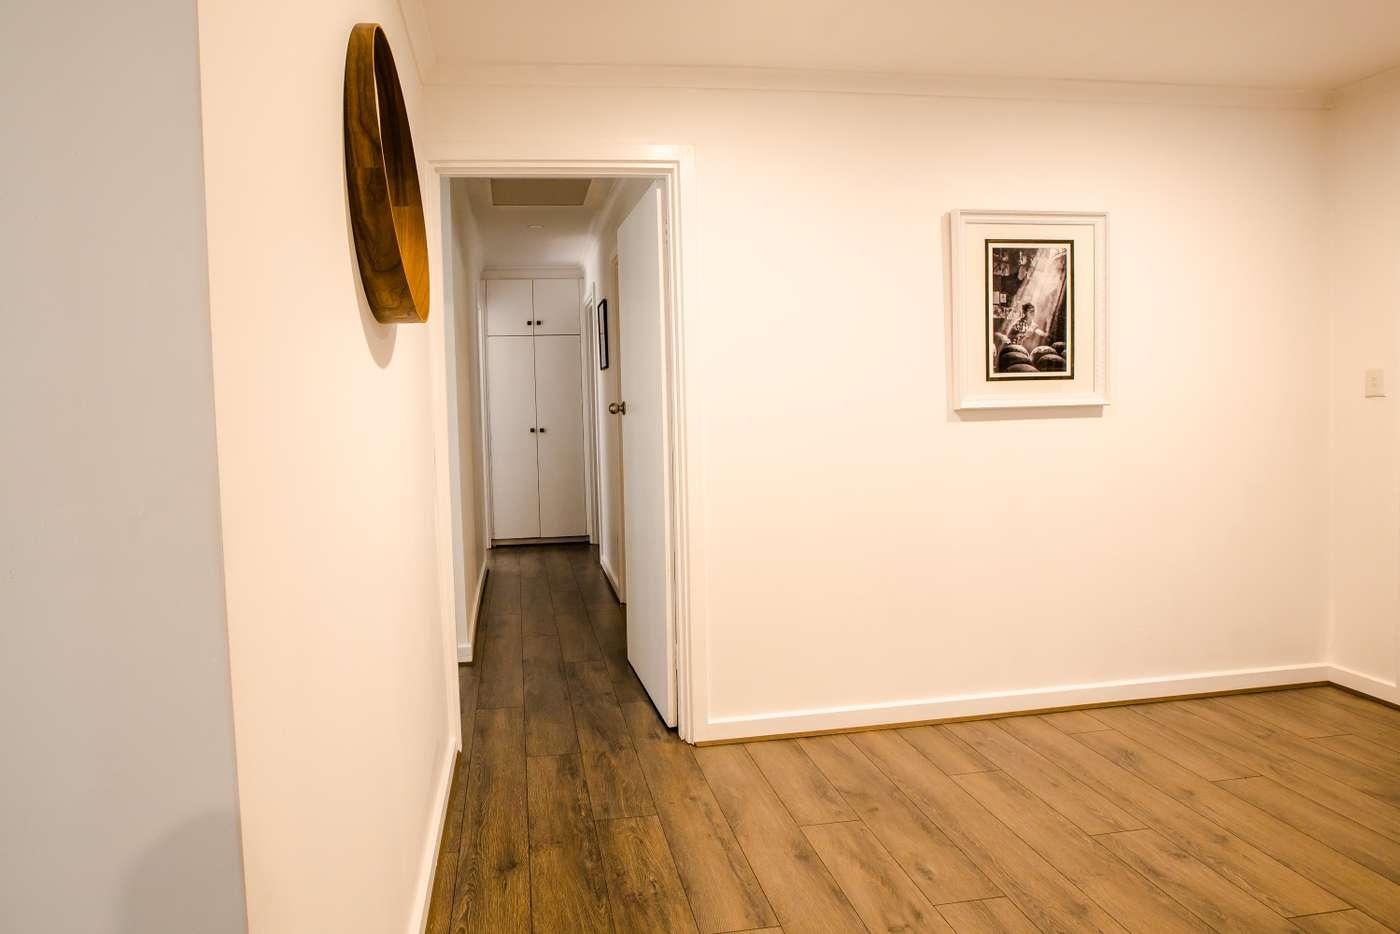 Sixth view of Homely house listing, 8 Riordan Street, Morphett Vale SA 5162